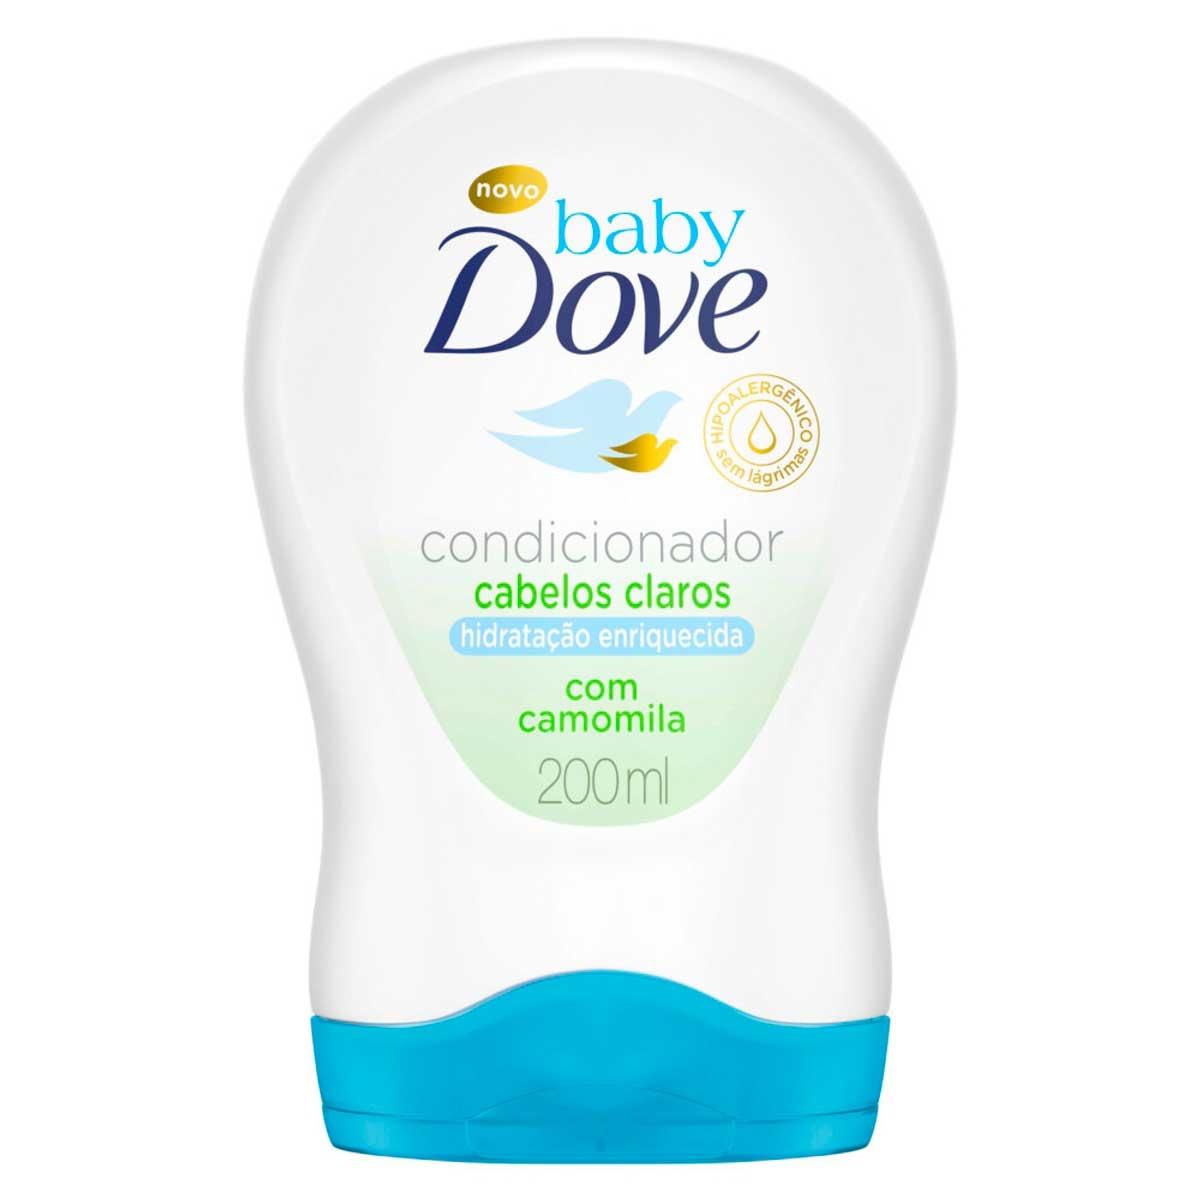 Condicionador Baby Dove Hidratação Enriquecida Cabelos Claros 200ml 200ml